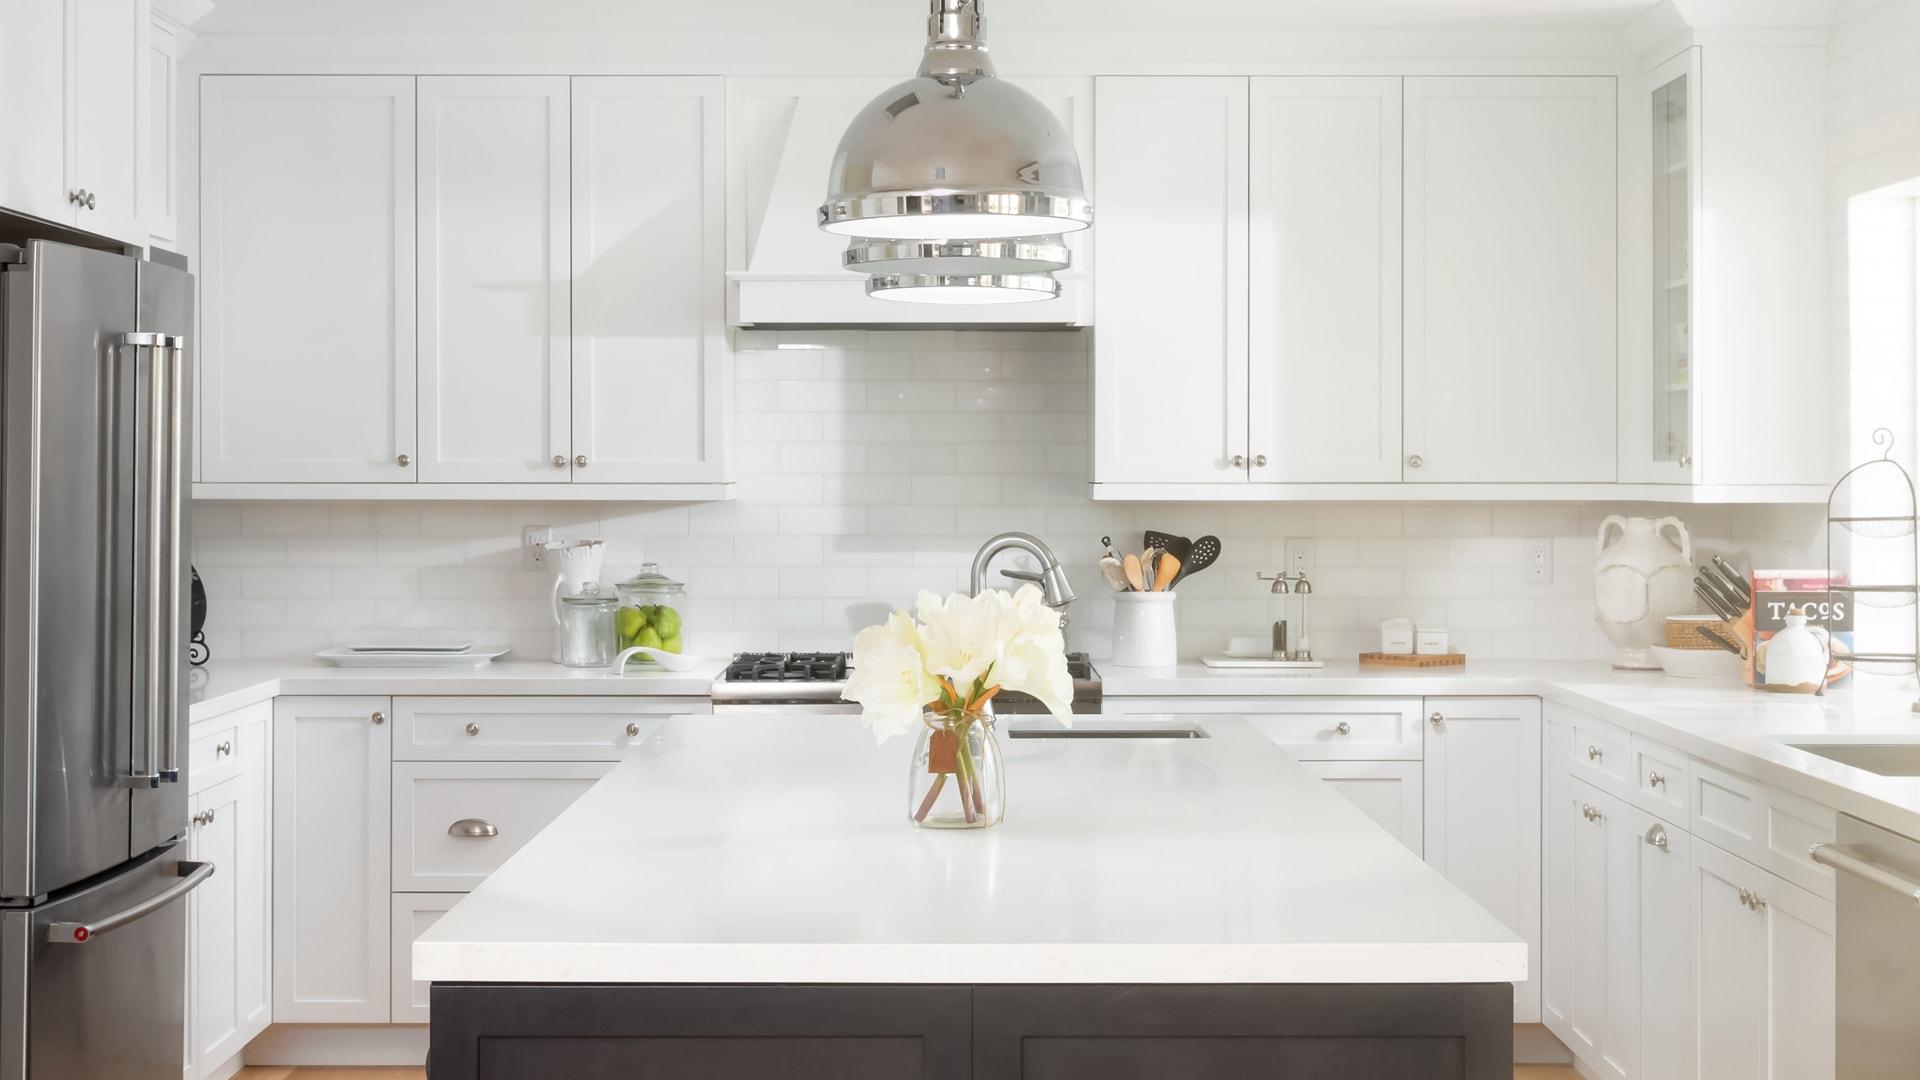 Superior Kitchen Cabinets Phoenix, Arizona U0026amp; Scottsdale | Cabinet Solutions USA